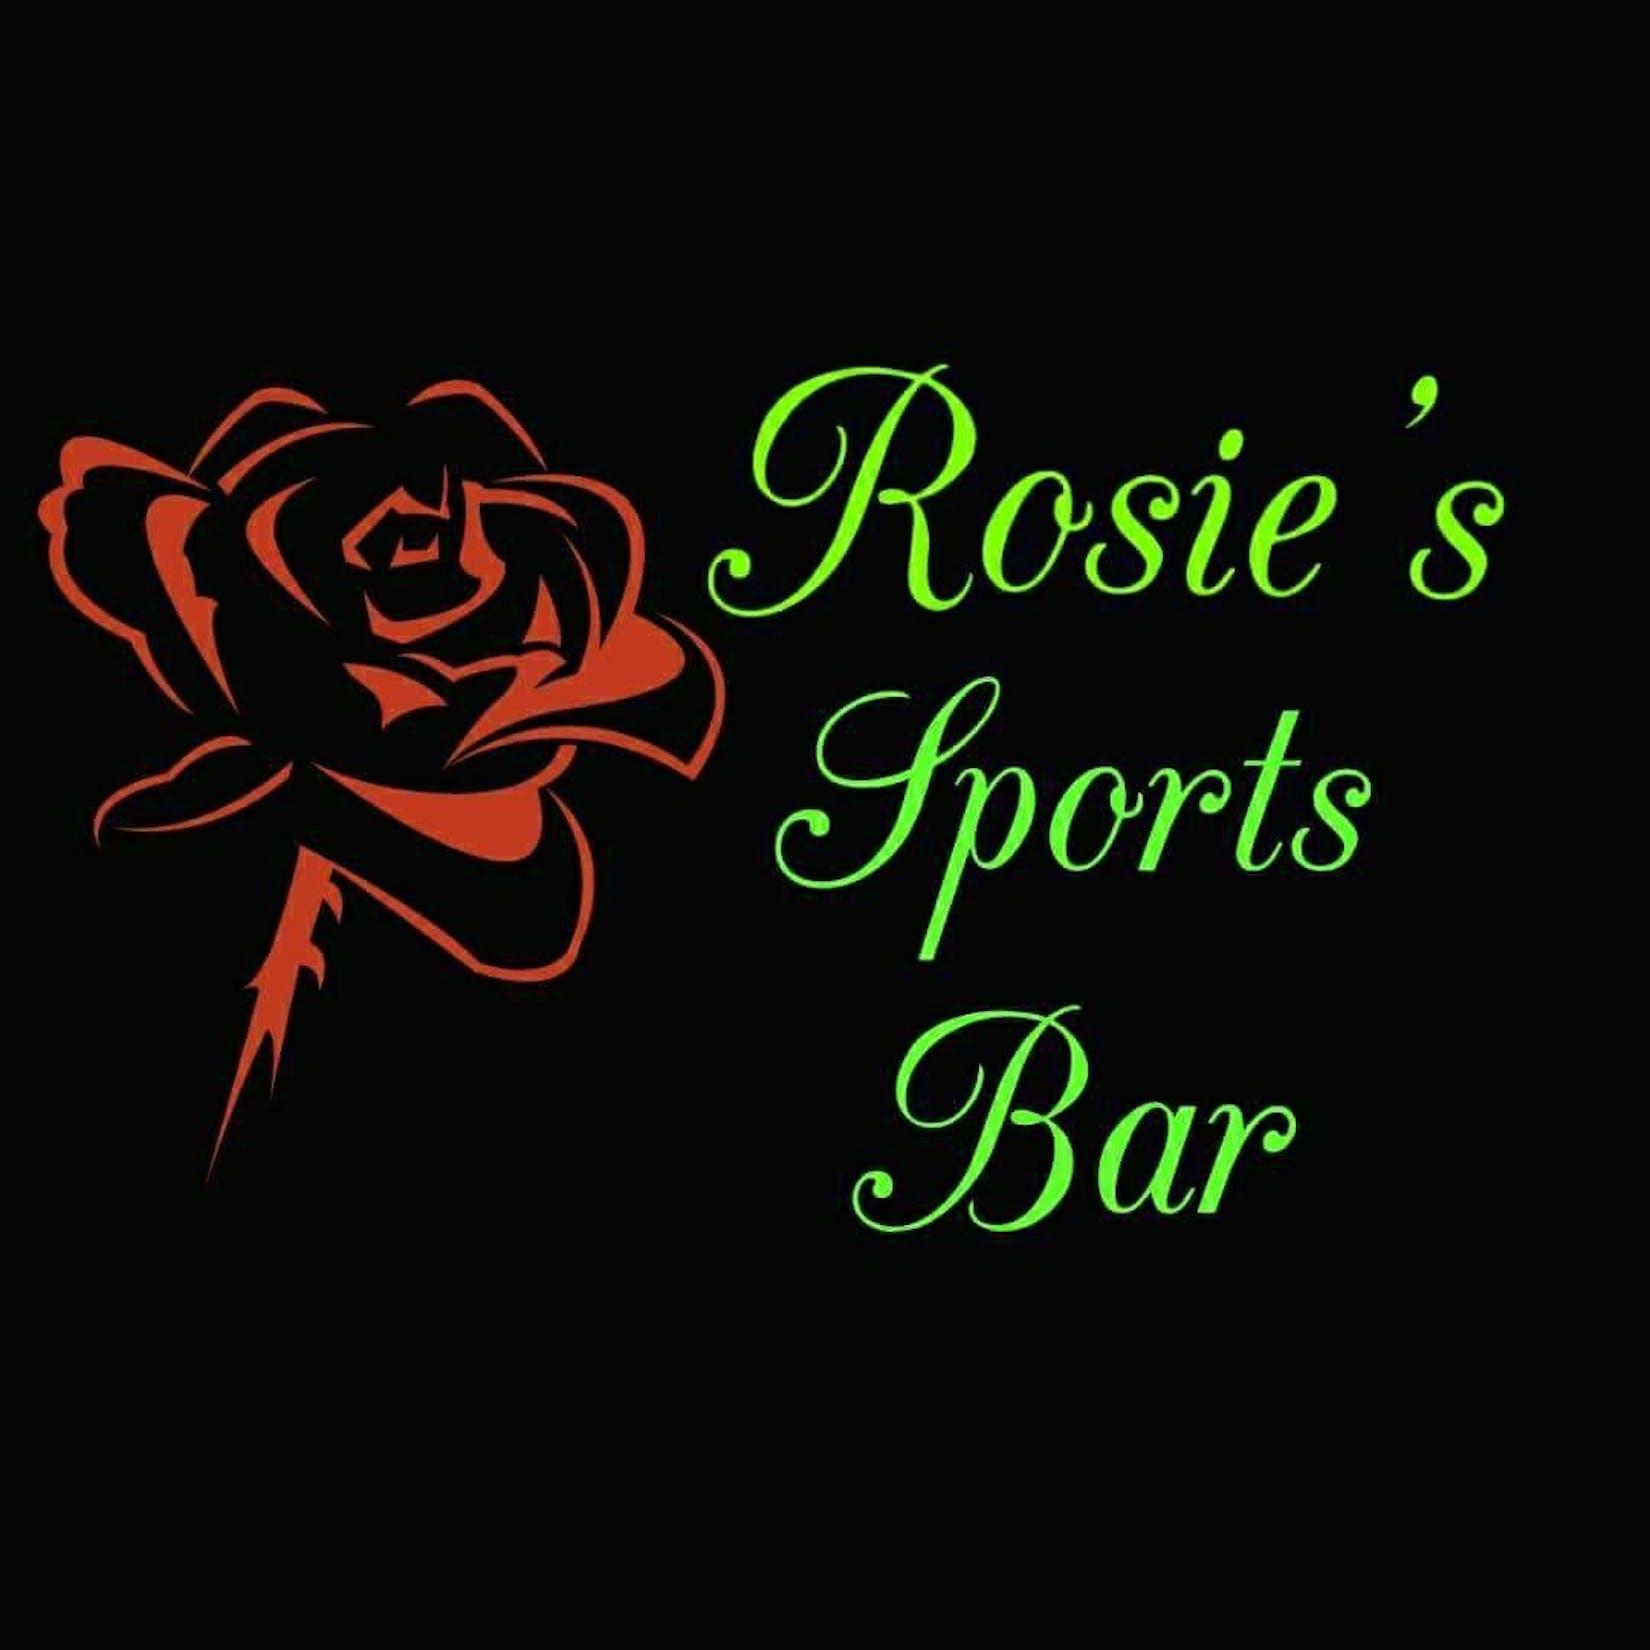 Rosie's Sports Bar | yathar